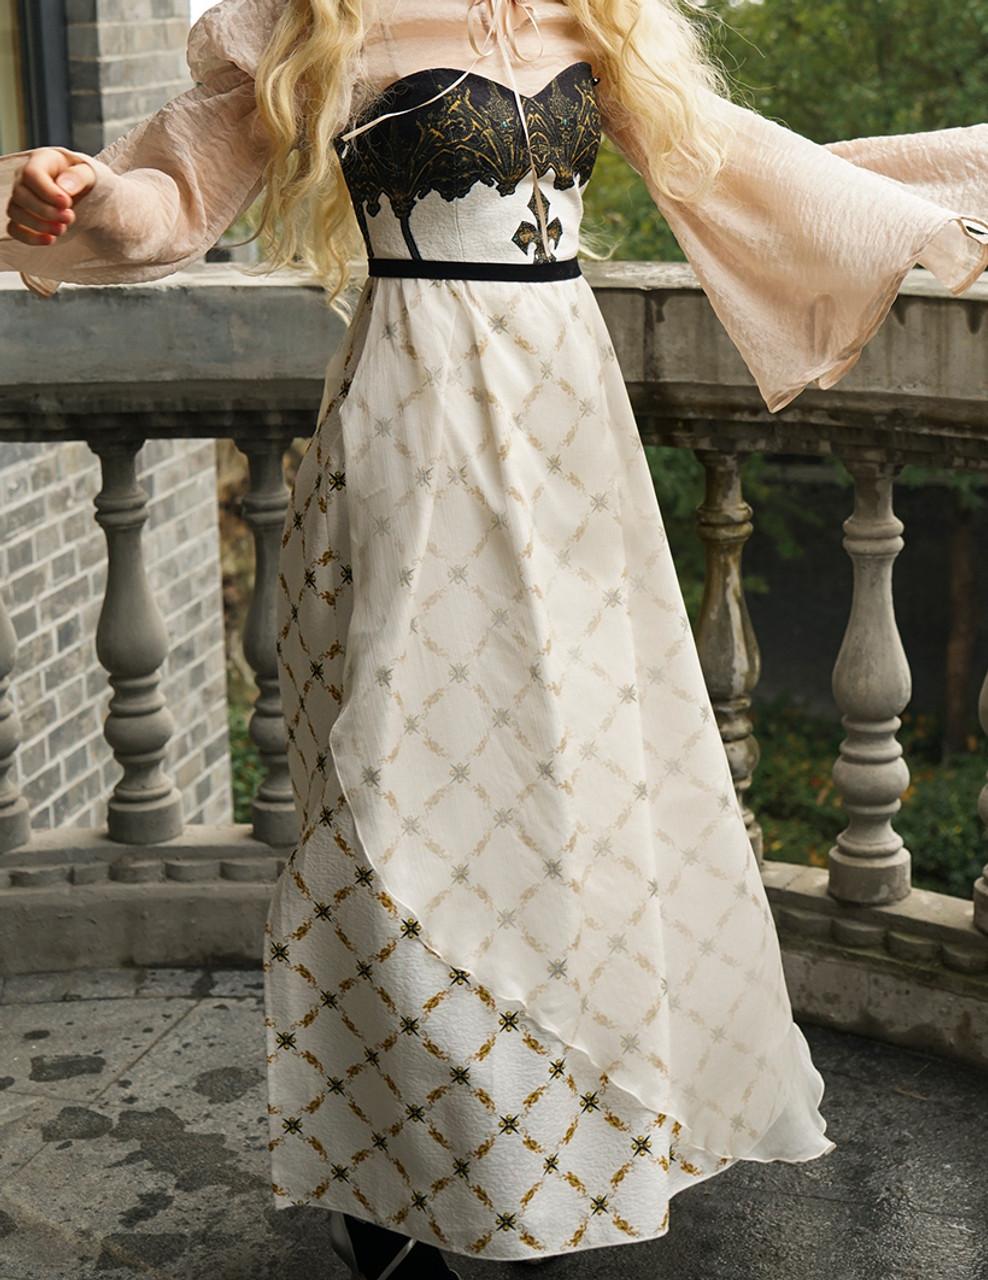 Corset Maxi Ball Dress, Empire Waist Regency Dress ivory/black ...